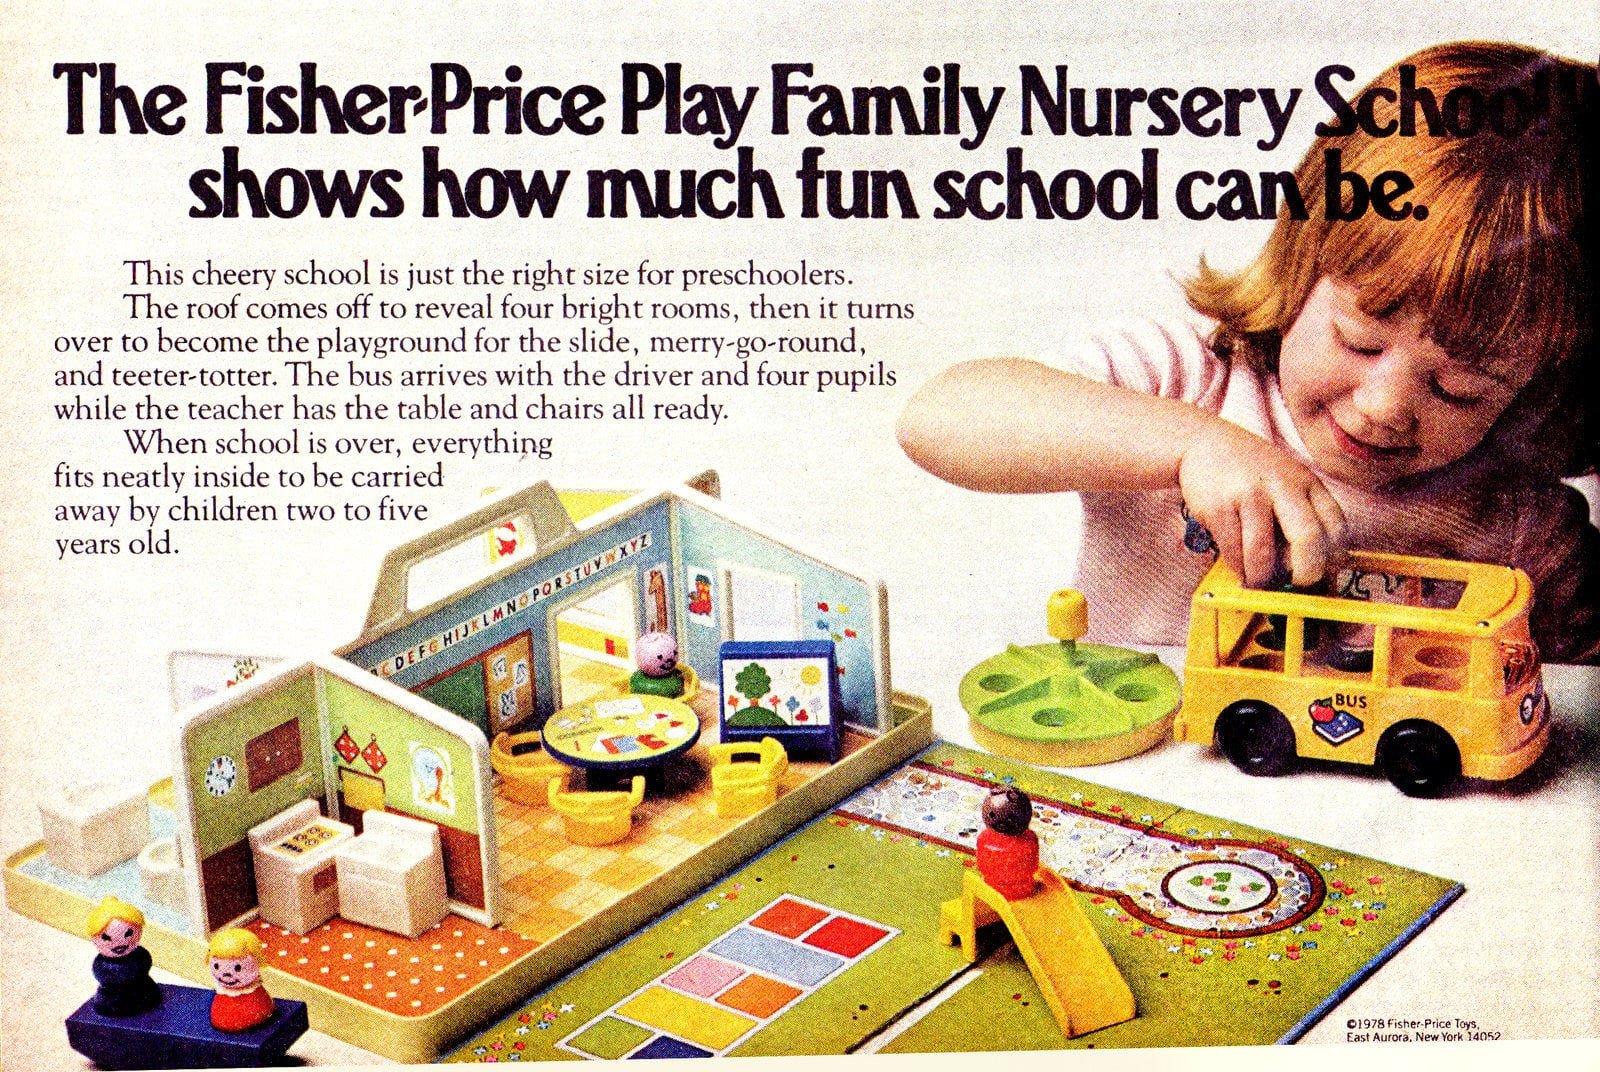 Fisher-Price Little People Play Family Nursery School set (1978)